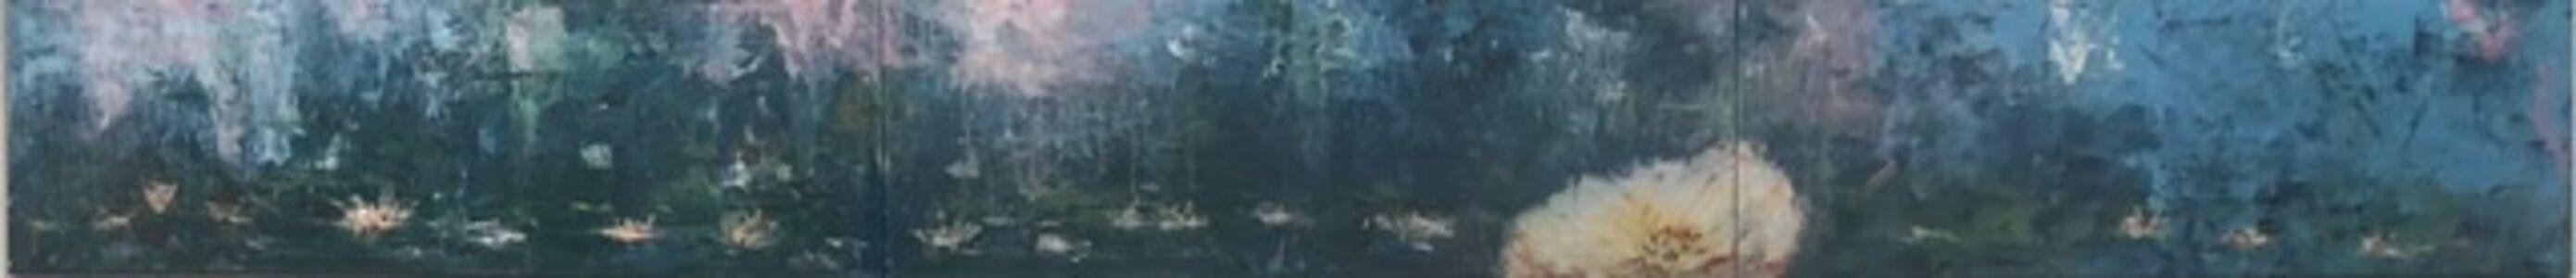 Joan Criscione, 'Always love me (Tryptic)', 2012